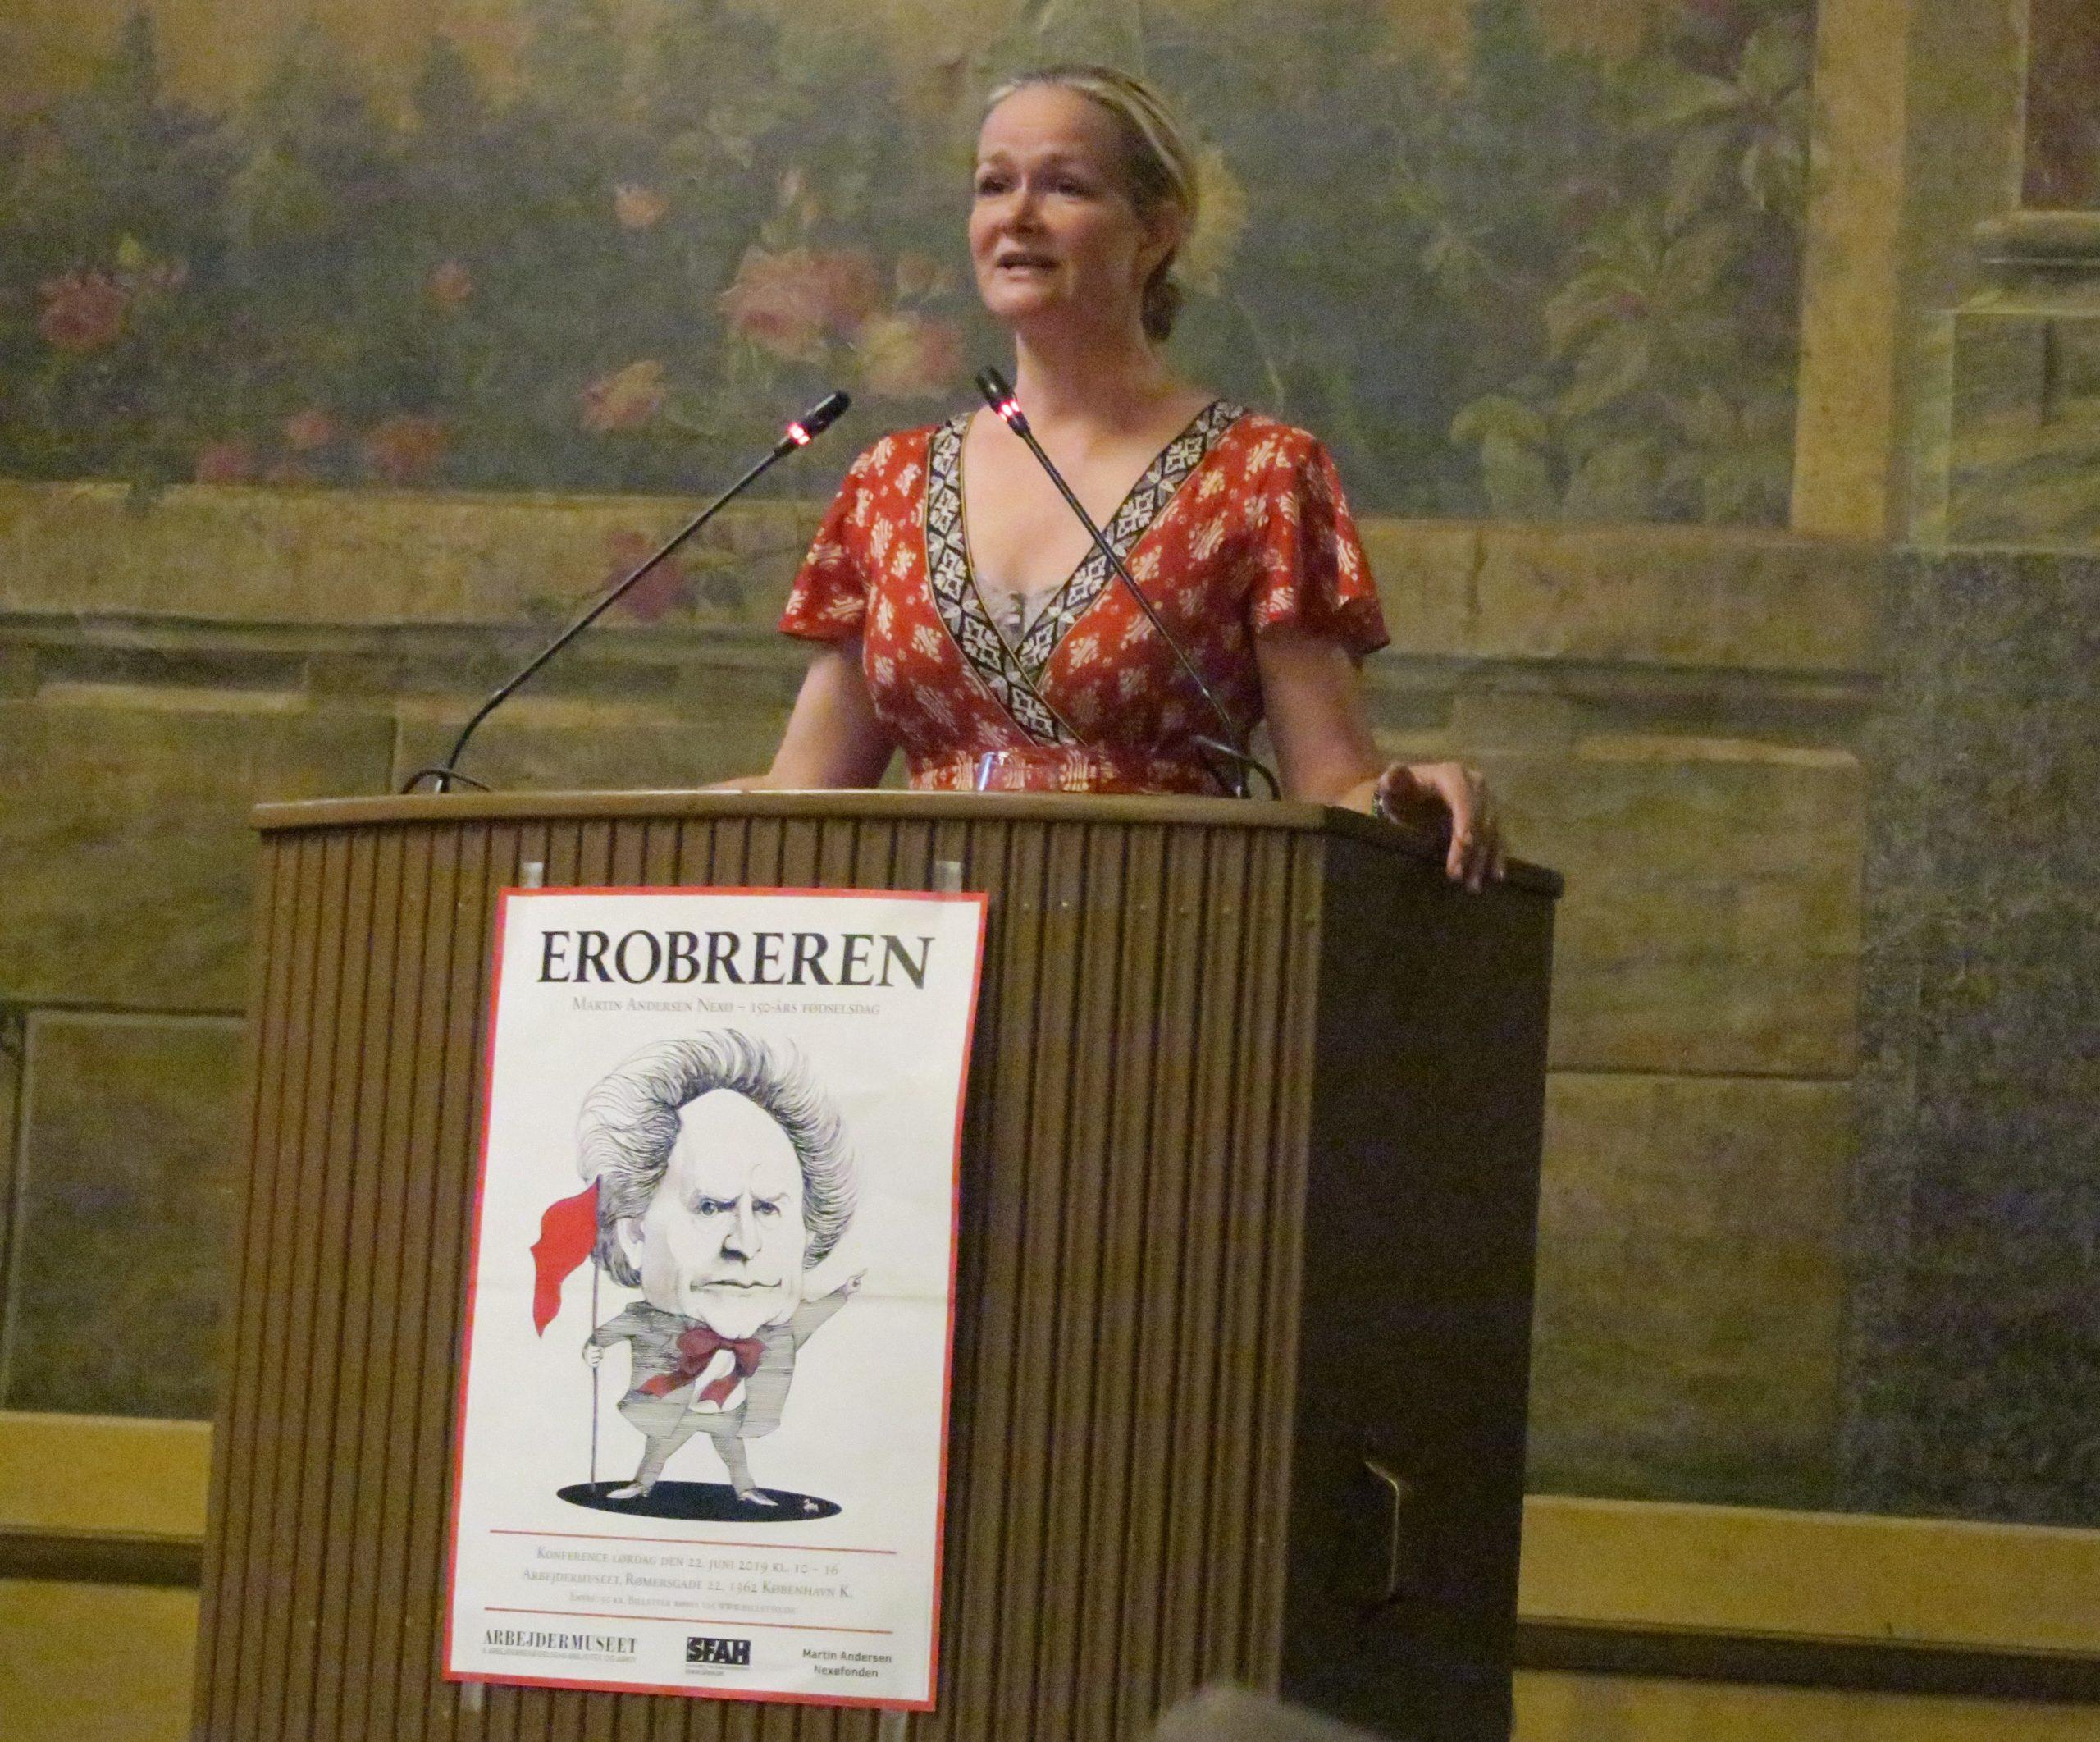 "Meta Foldager ""Filmproducer"" taler om Nexøs forfatterskab som filmmateriale"